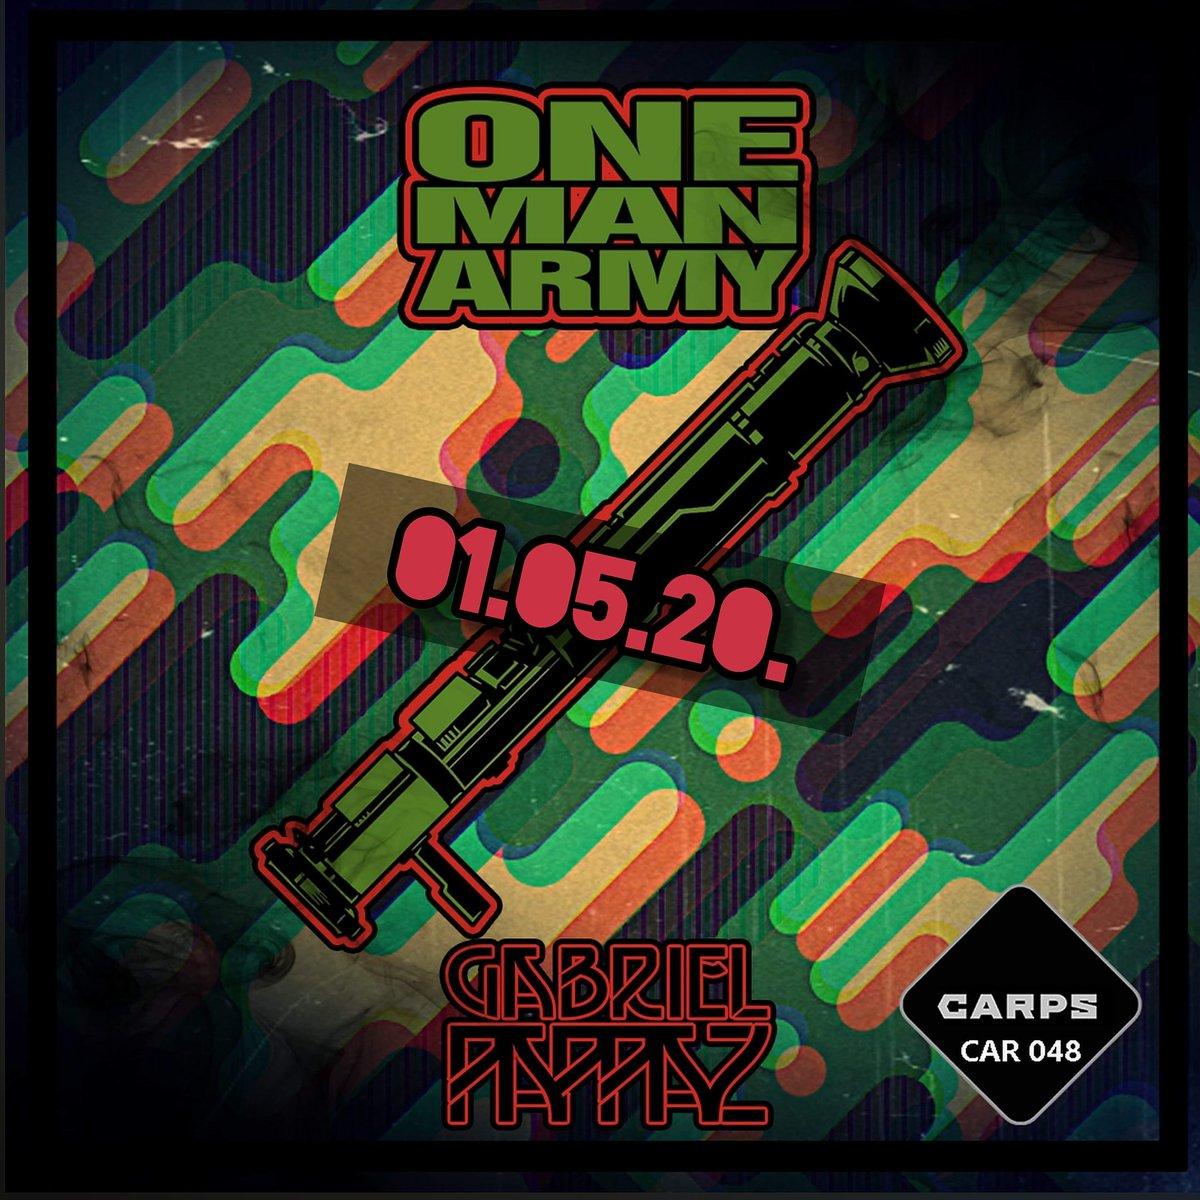 Release Artist:Gabriel Pappaz Release Title:One Man Army Catalogue Number: CAR048 Label: CARPS Release Type: Single  #2020 #techno #technomusic #technoproducer #rave #single #onemanarmy #acid #acidtechno #hardtechno #hardpic.twitter.com/w53QKYeTk5